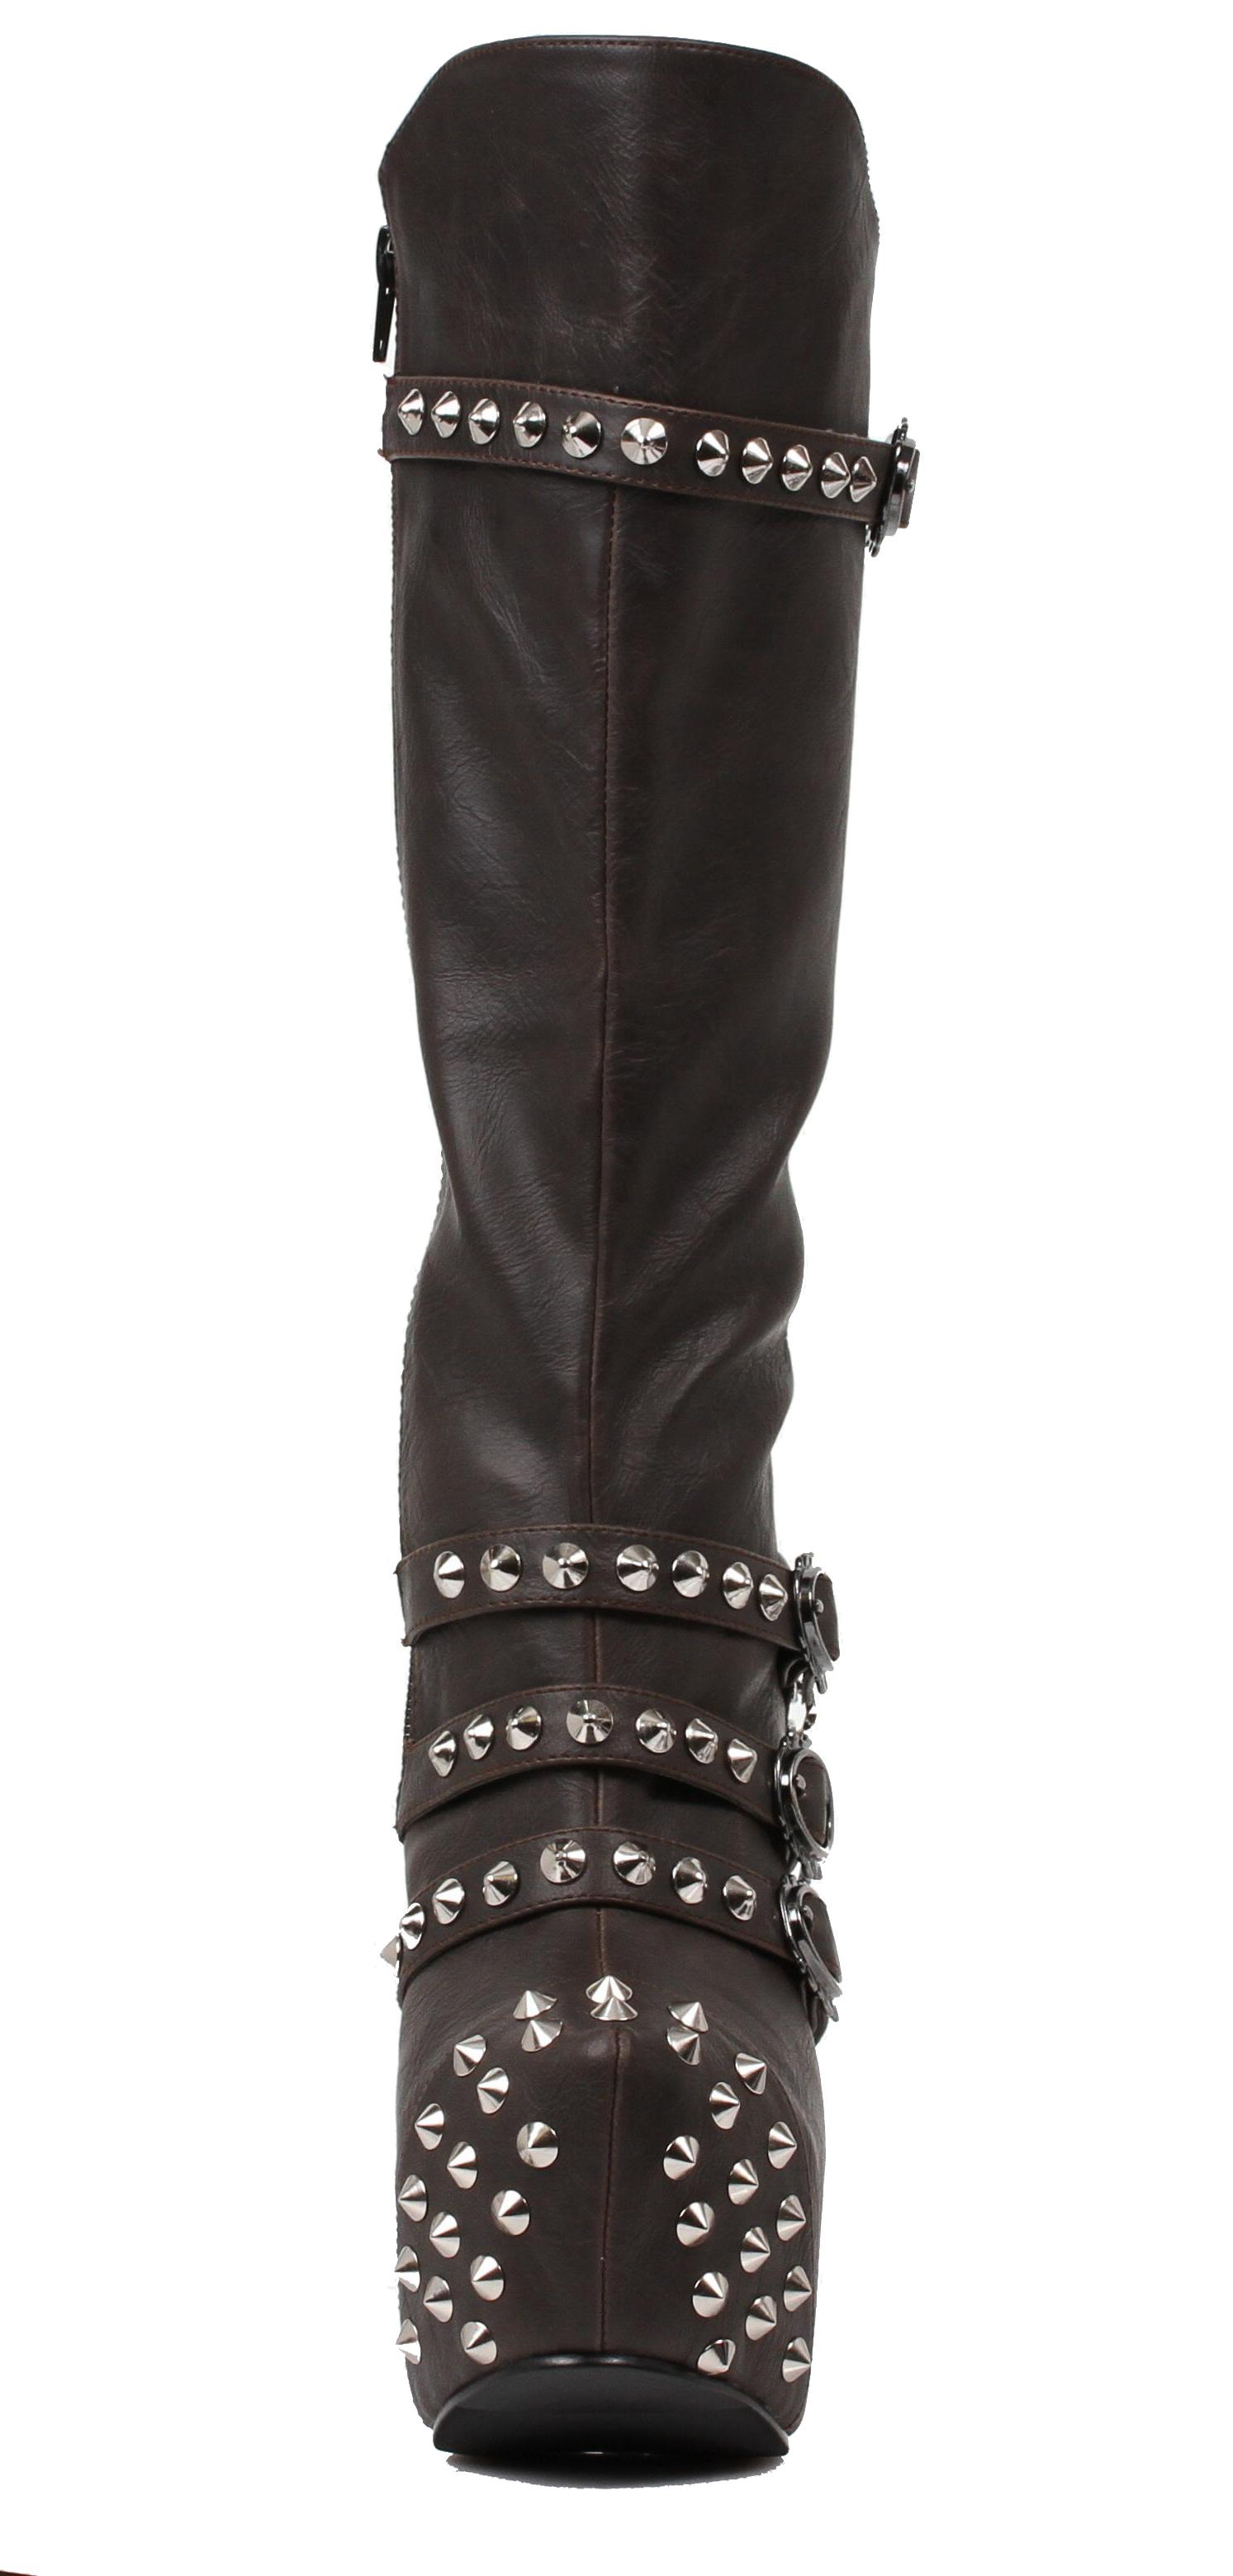 hades_shoes_womens_valda_black_steampunk_boots_boots_4.jpg